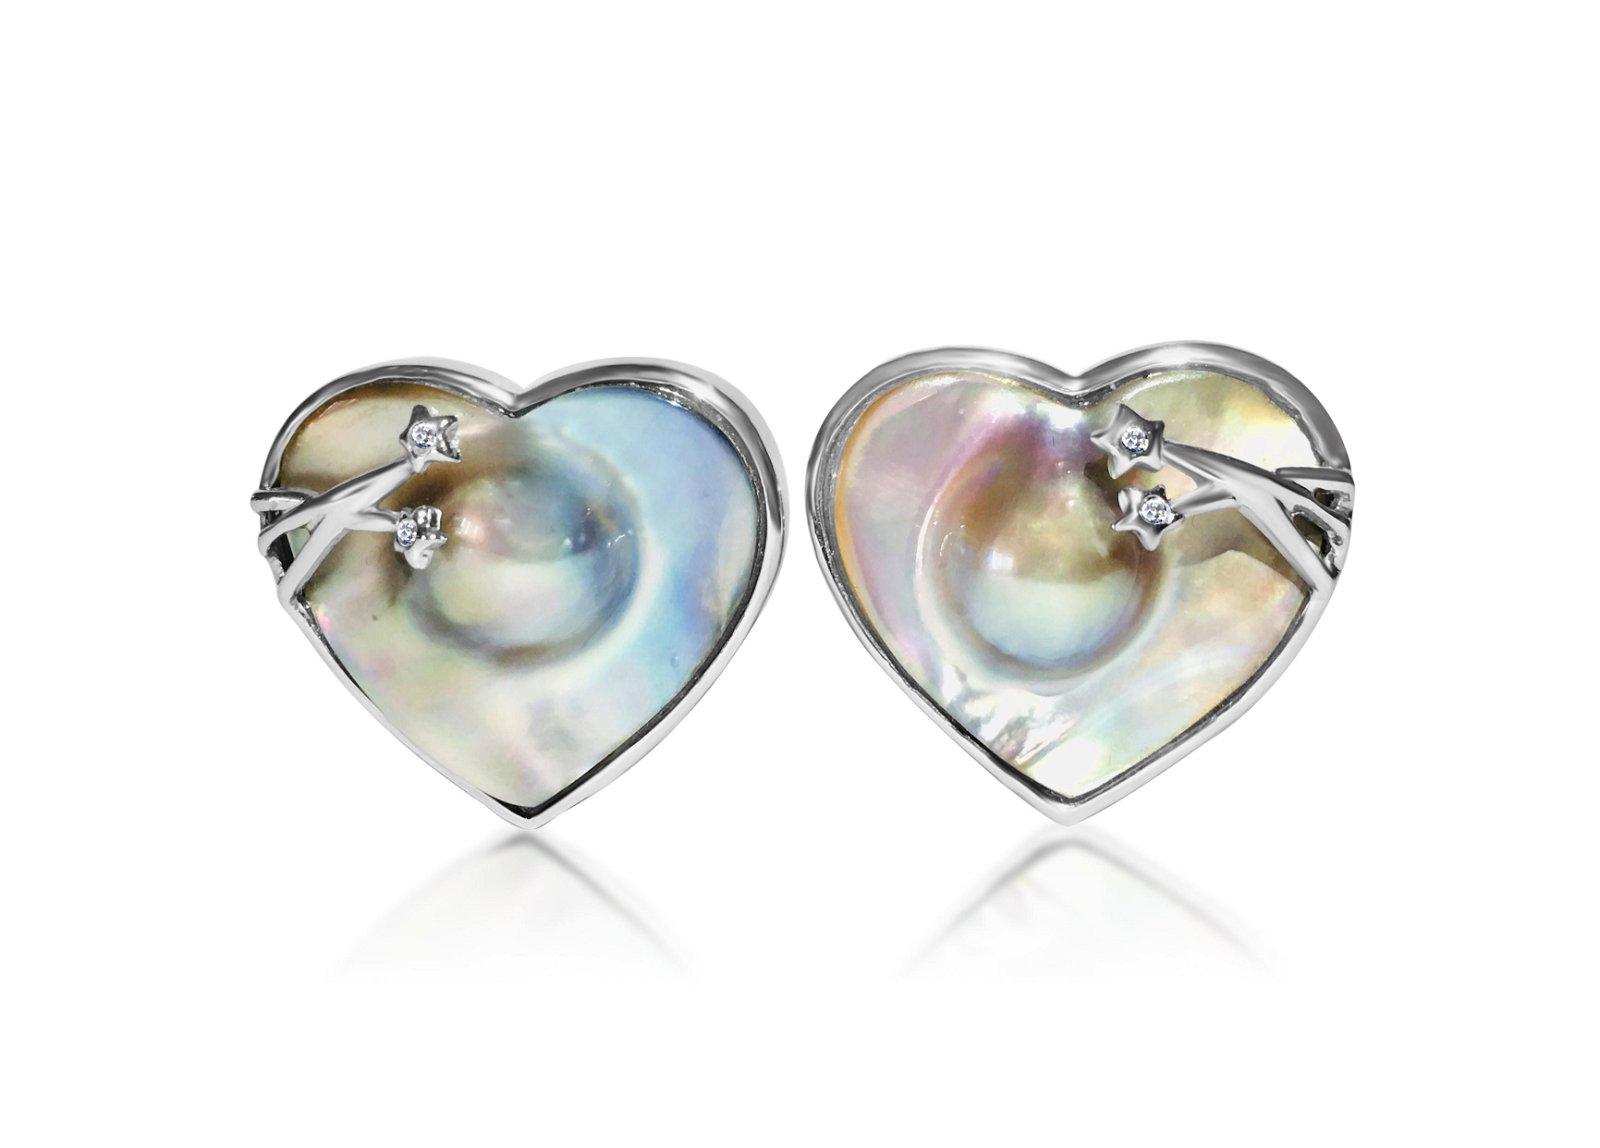 Mother of Pearl & Diamond in Sterling Silver Earrings.